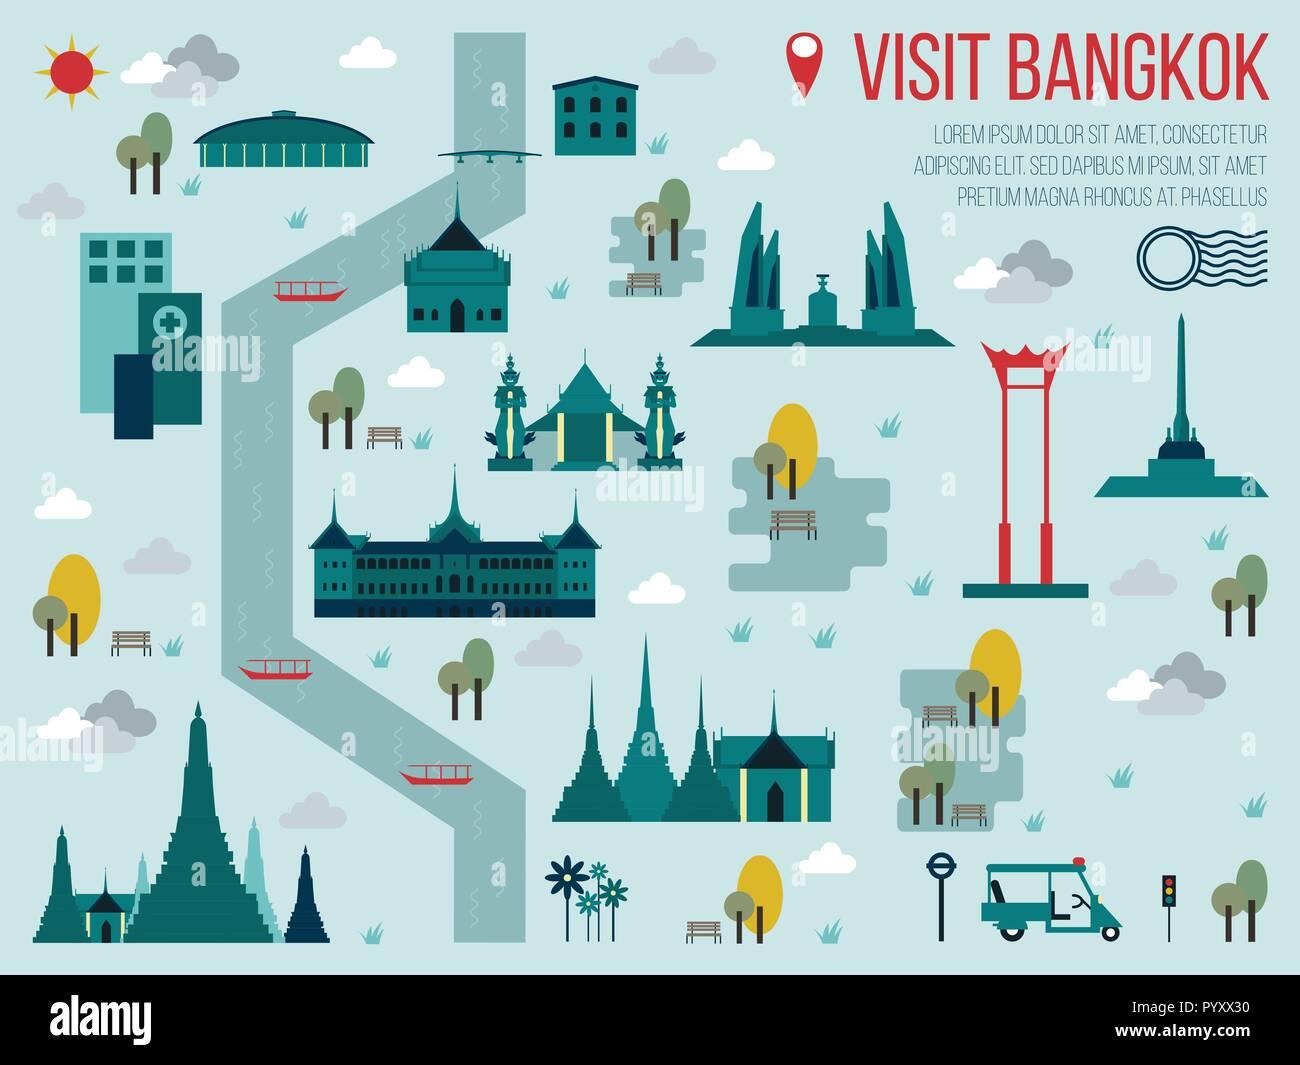 Illustration of Visit Bangkok Travel Map Concept - Stock Image